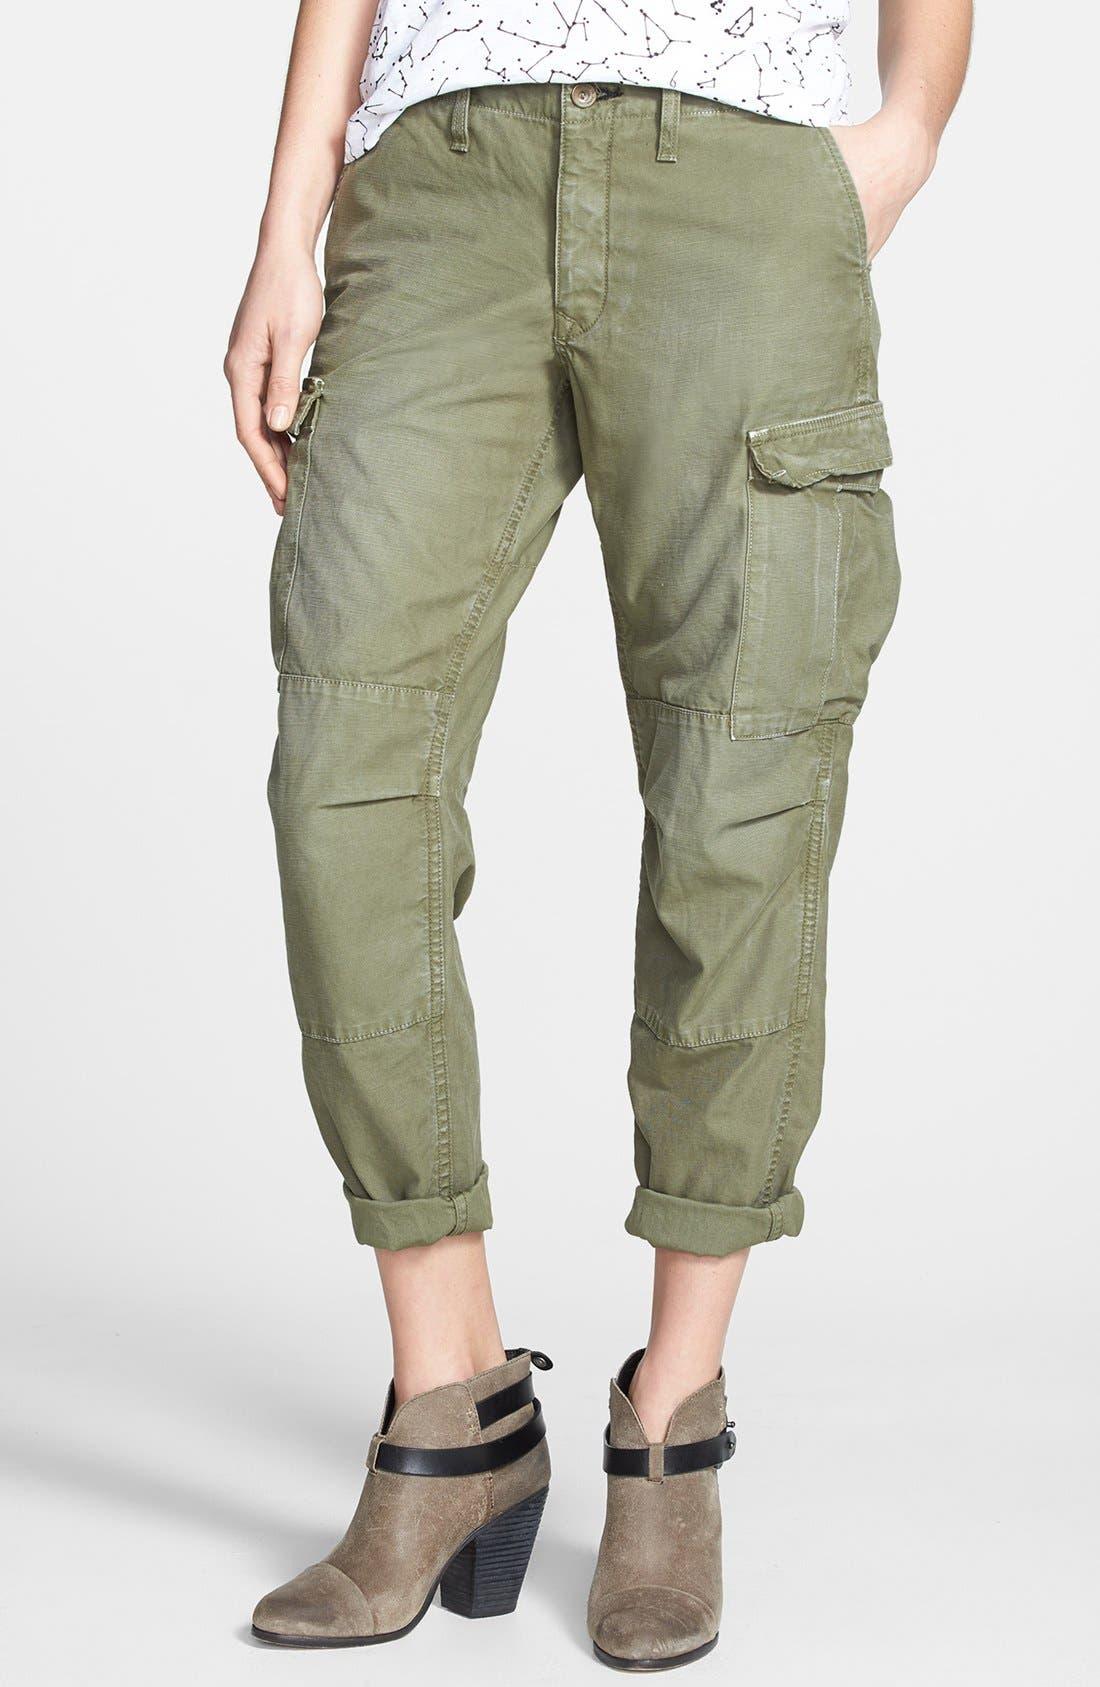 JEAN 'Combat' Cargo Pants, Main, color, 300